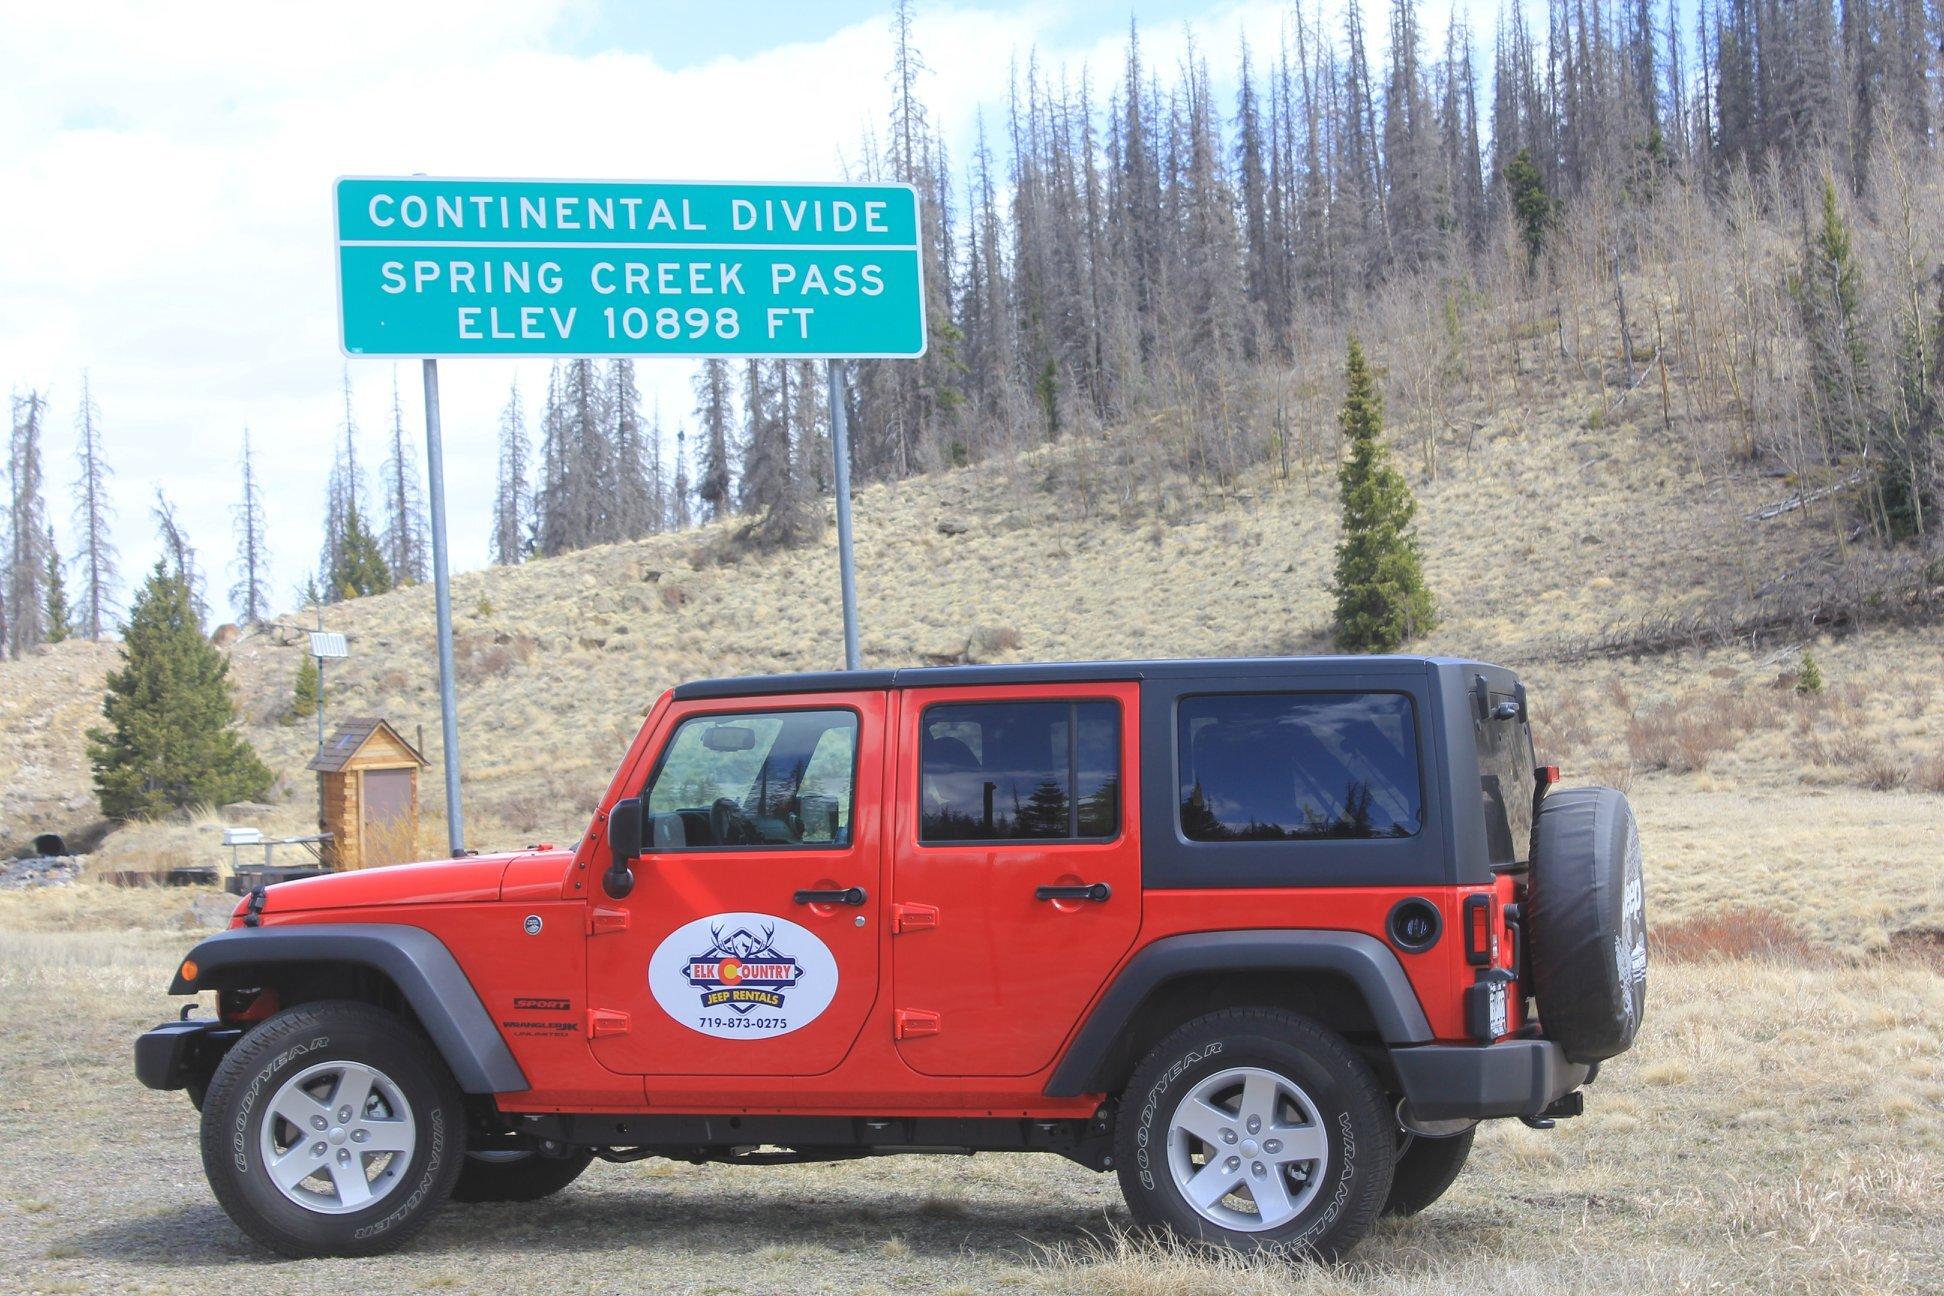 Image for JR) Jeep Rental - Red